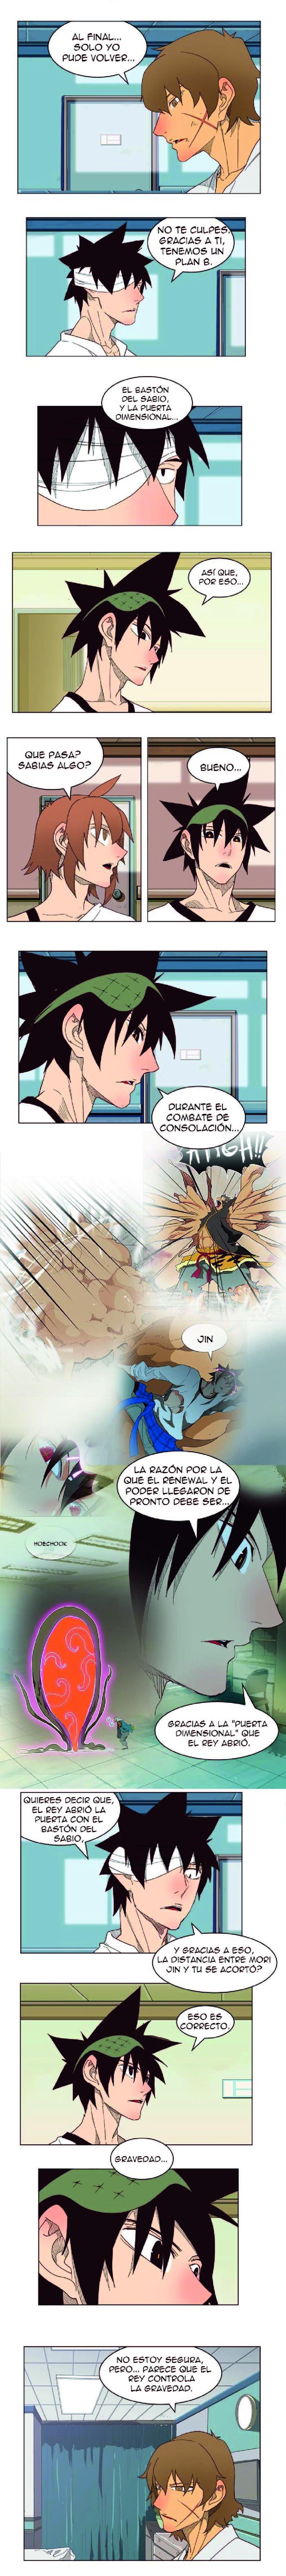 http://c5.ninemanga.com/es_manga/37/485/439576/f3d40945077a8cb357098311250d4213.jpg Page 9